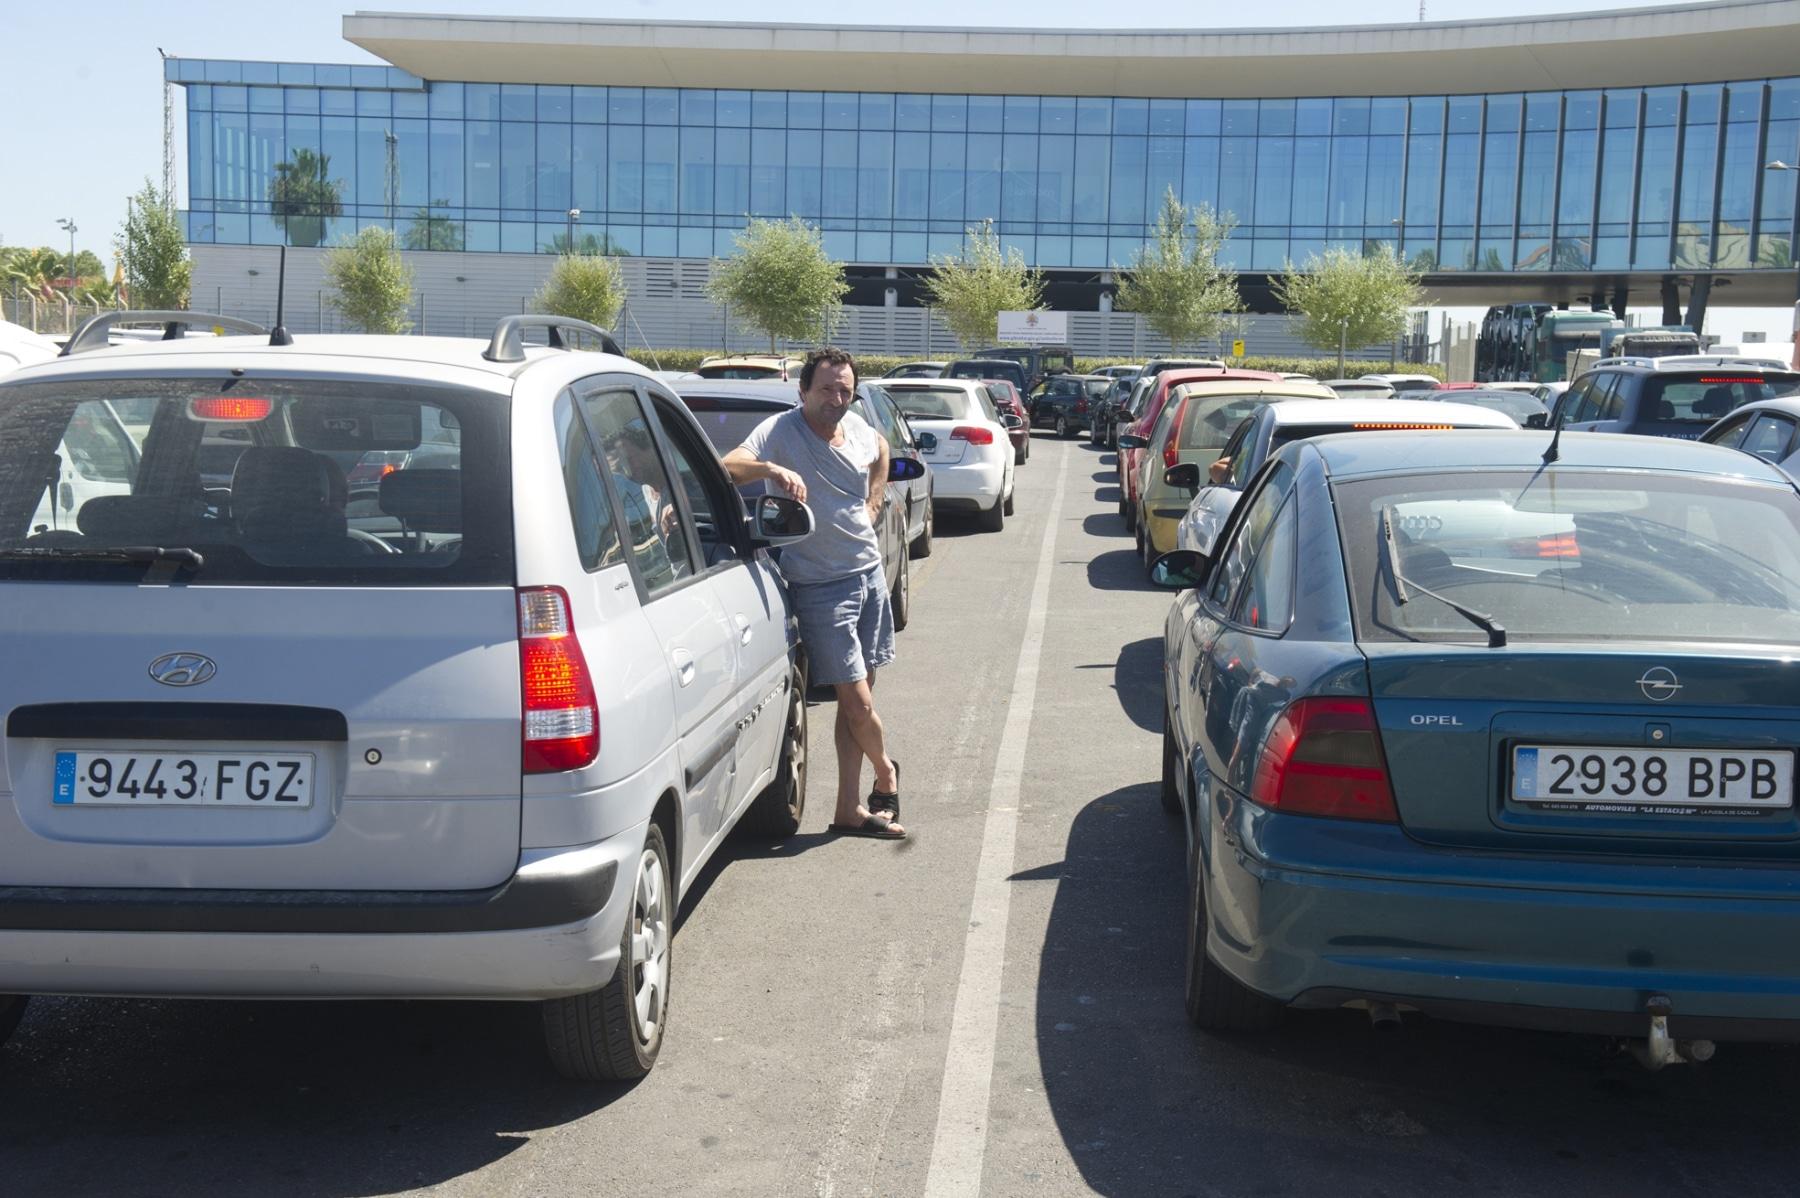 21-agosto-2014-colas-de-entrada-y-salida-de-gibraltar19_14986635161_o